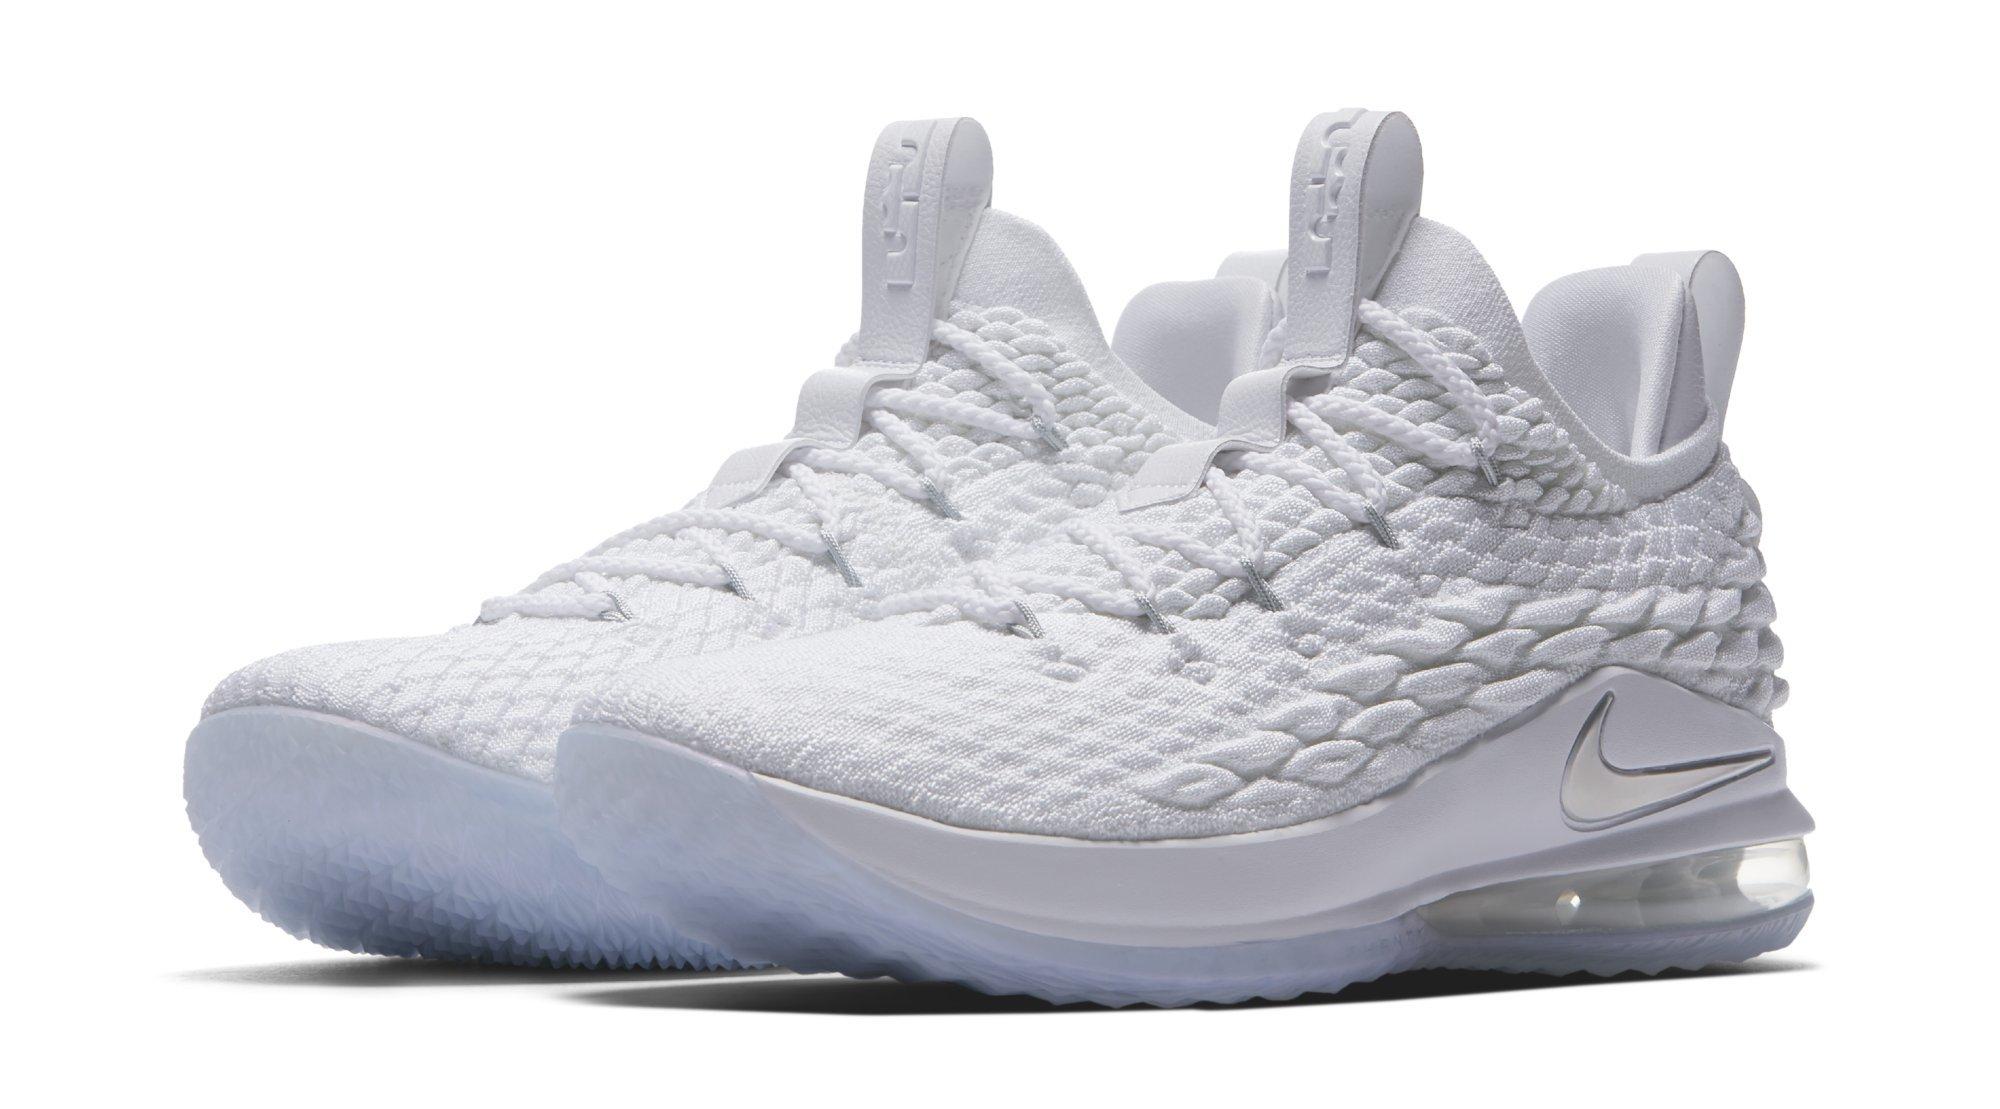 size 40 5d273 79aa2 Nike LeBron 15 Low White Metallic Silver Release Date AO1755 ...